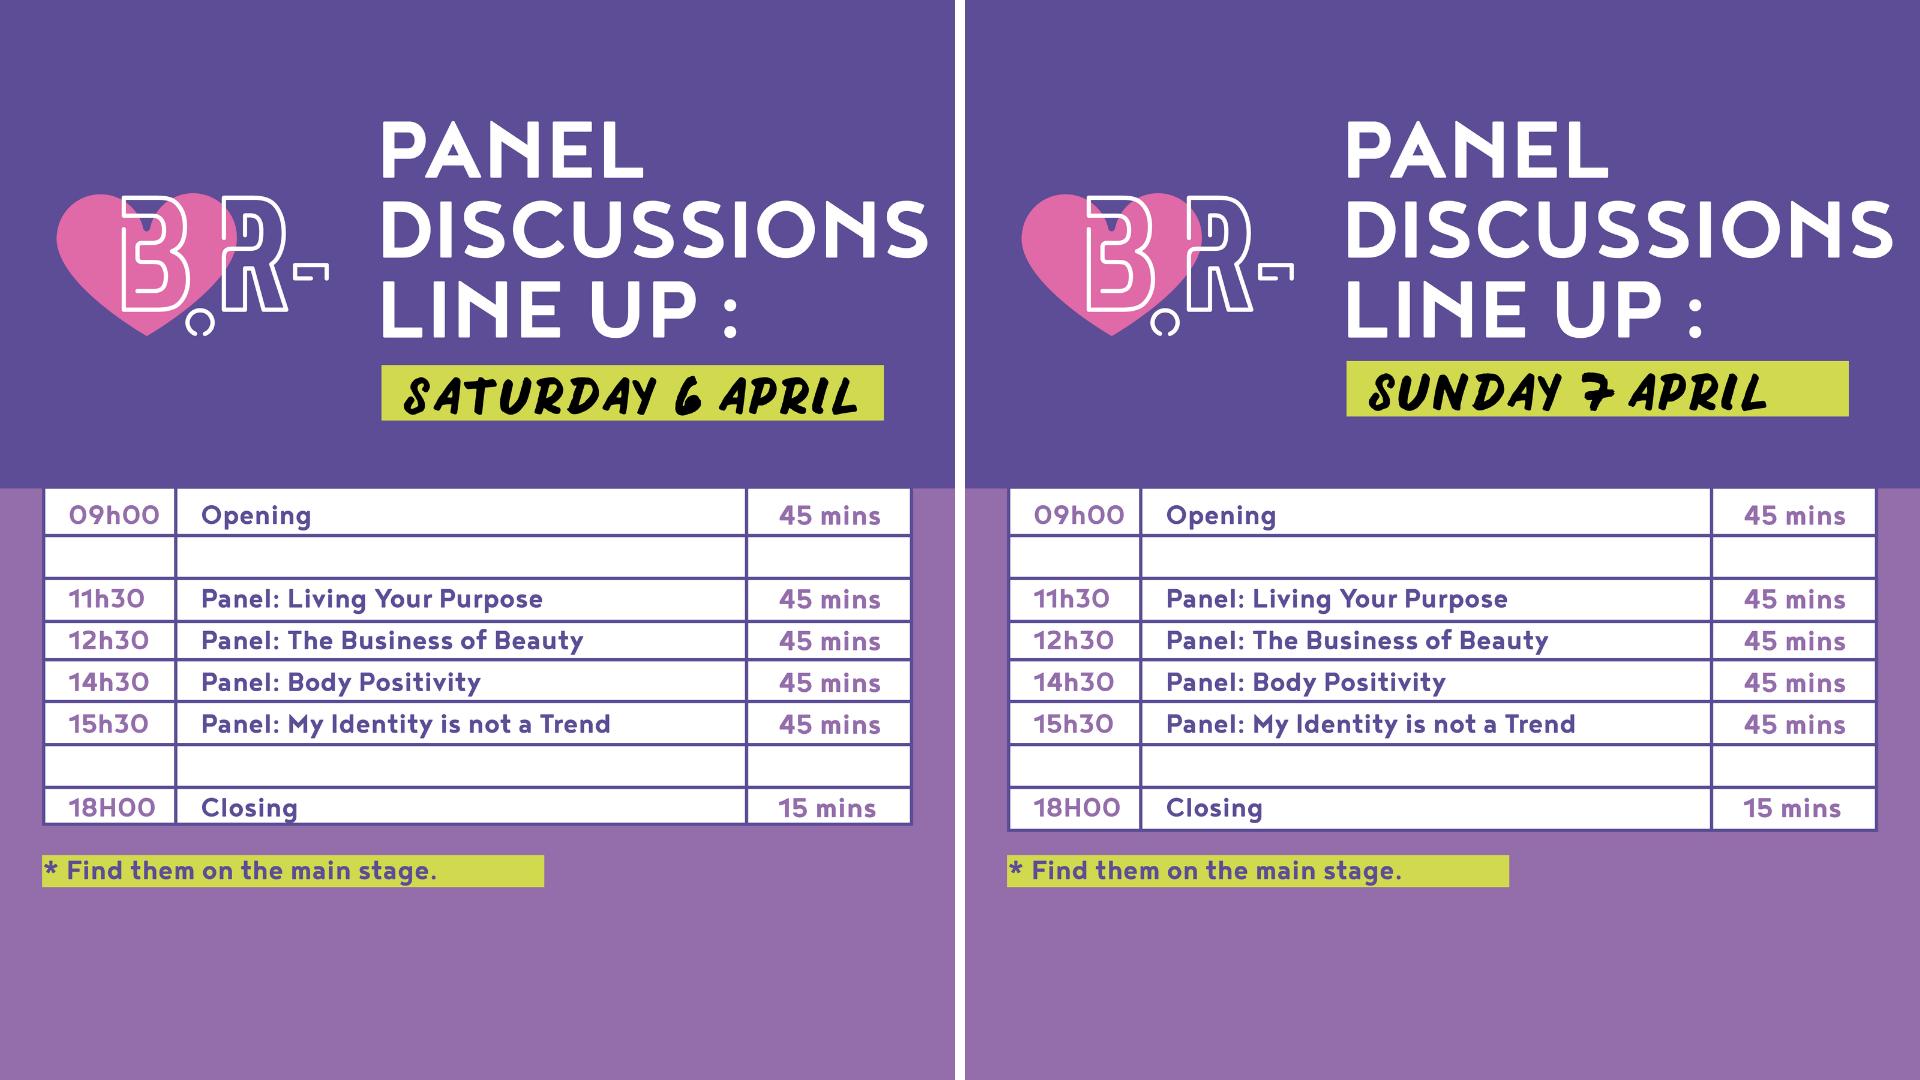 Panels Lineup.png